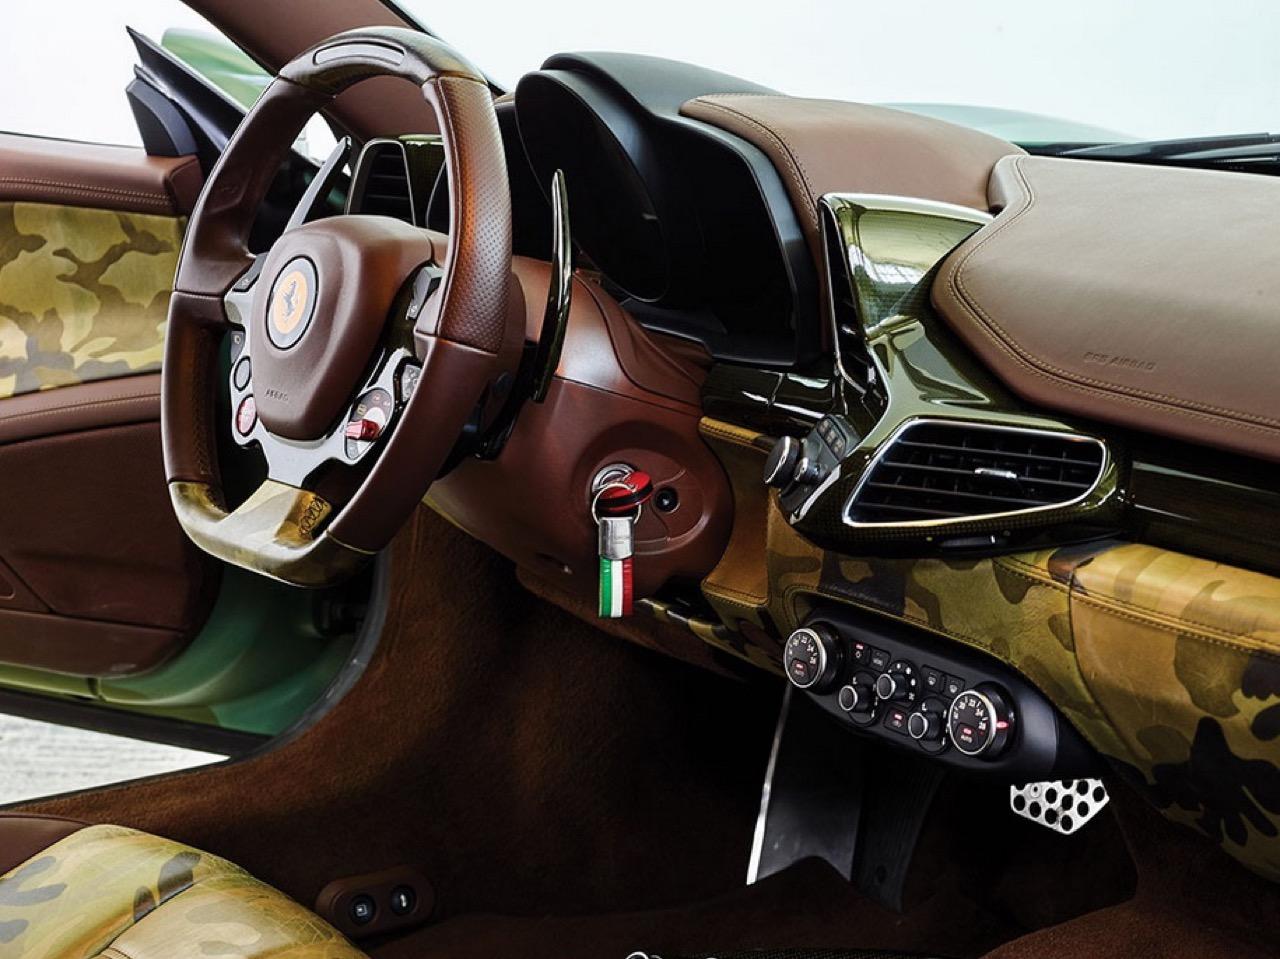 Ferrari 458 Italia Lapo Elkann in auction (8)